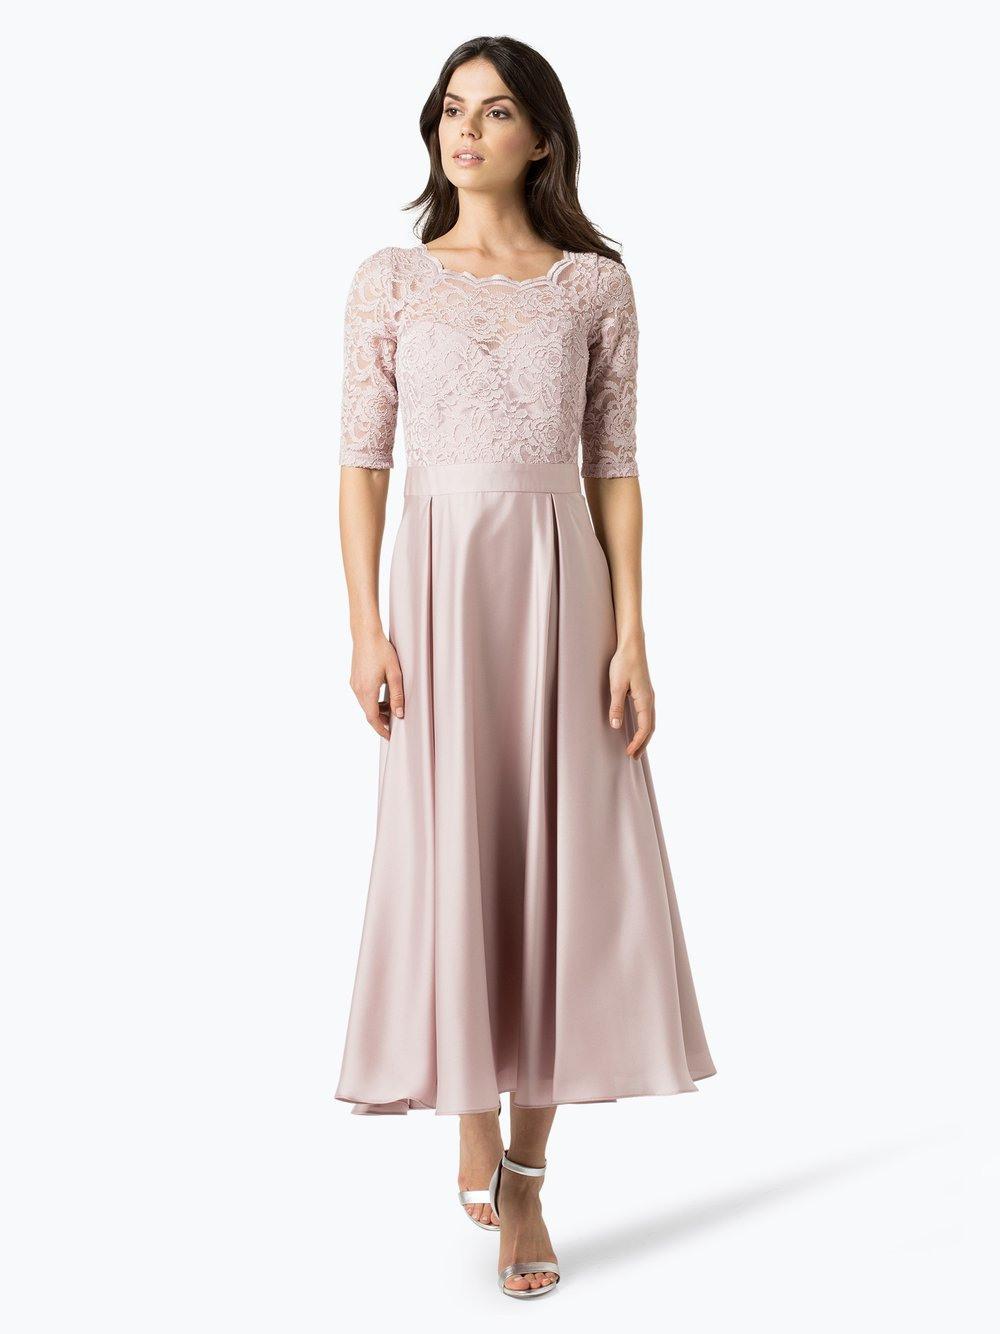 Designer Elegant Swing Abendkleid Galerie10 Perfekt Swing Abendkleid für 2019